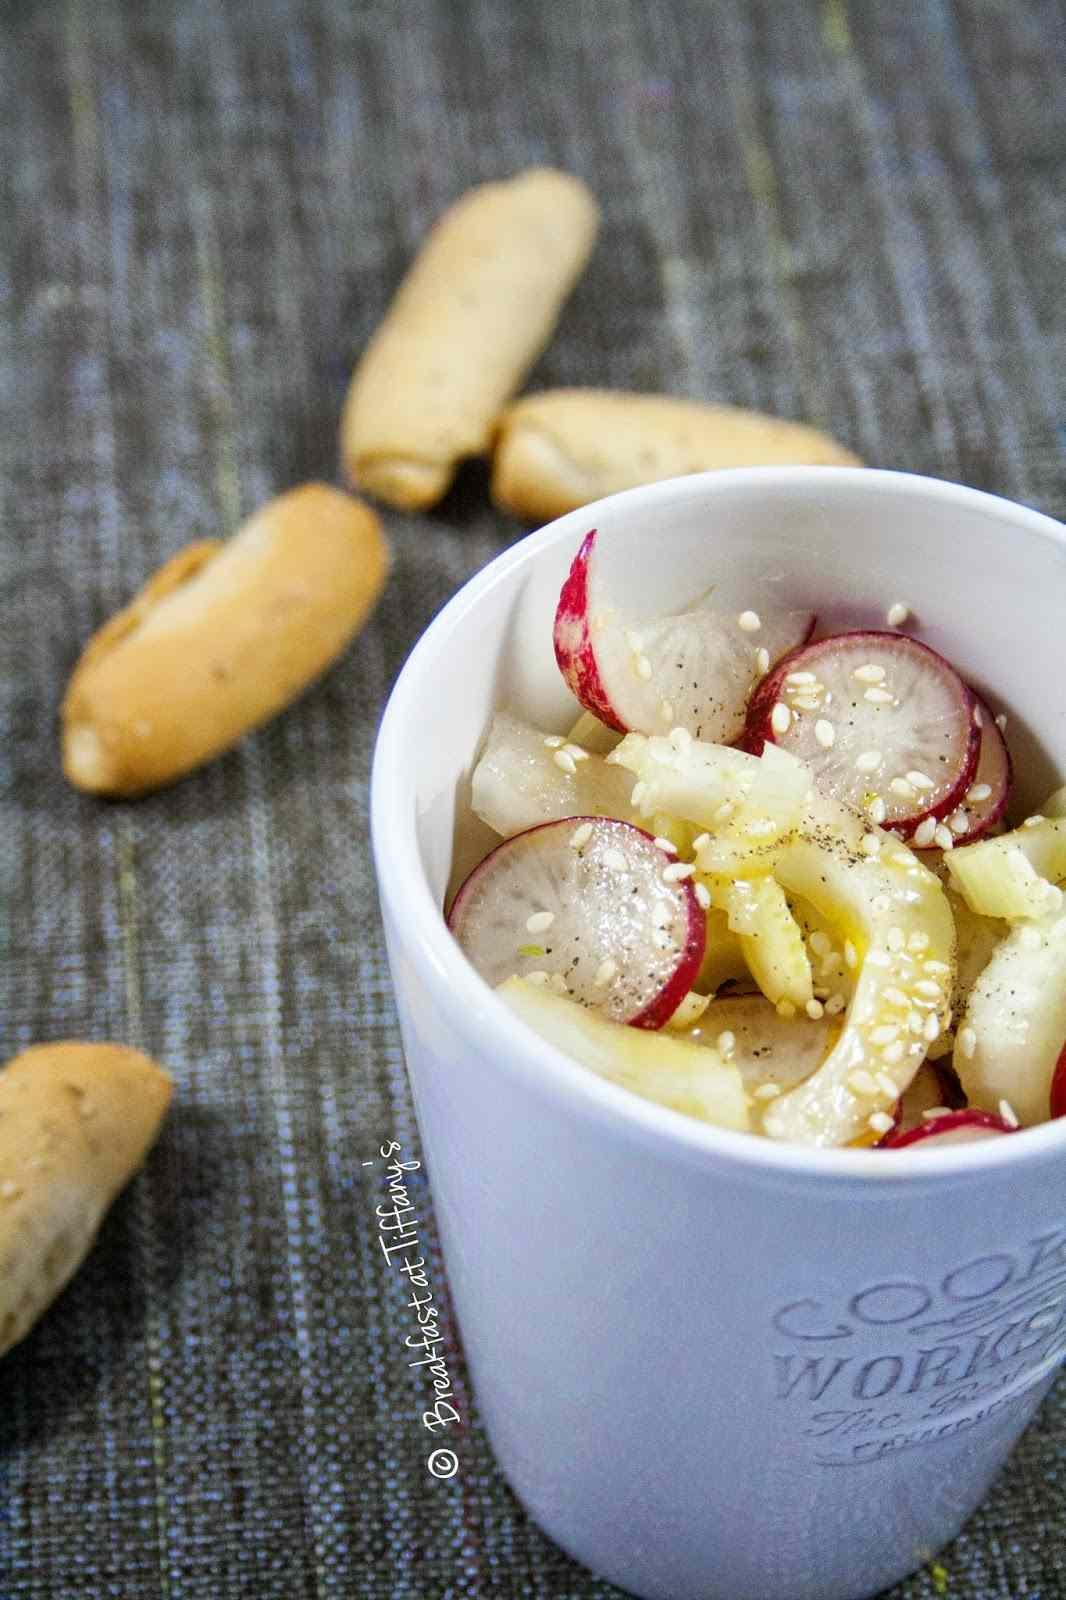 Ricetta: Insalata ravanelli e finocchio / Radishes and fennel salad